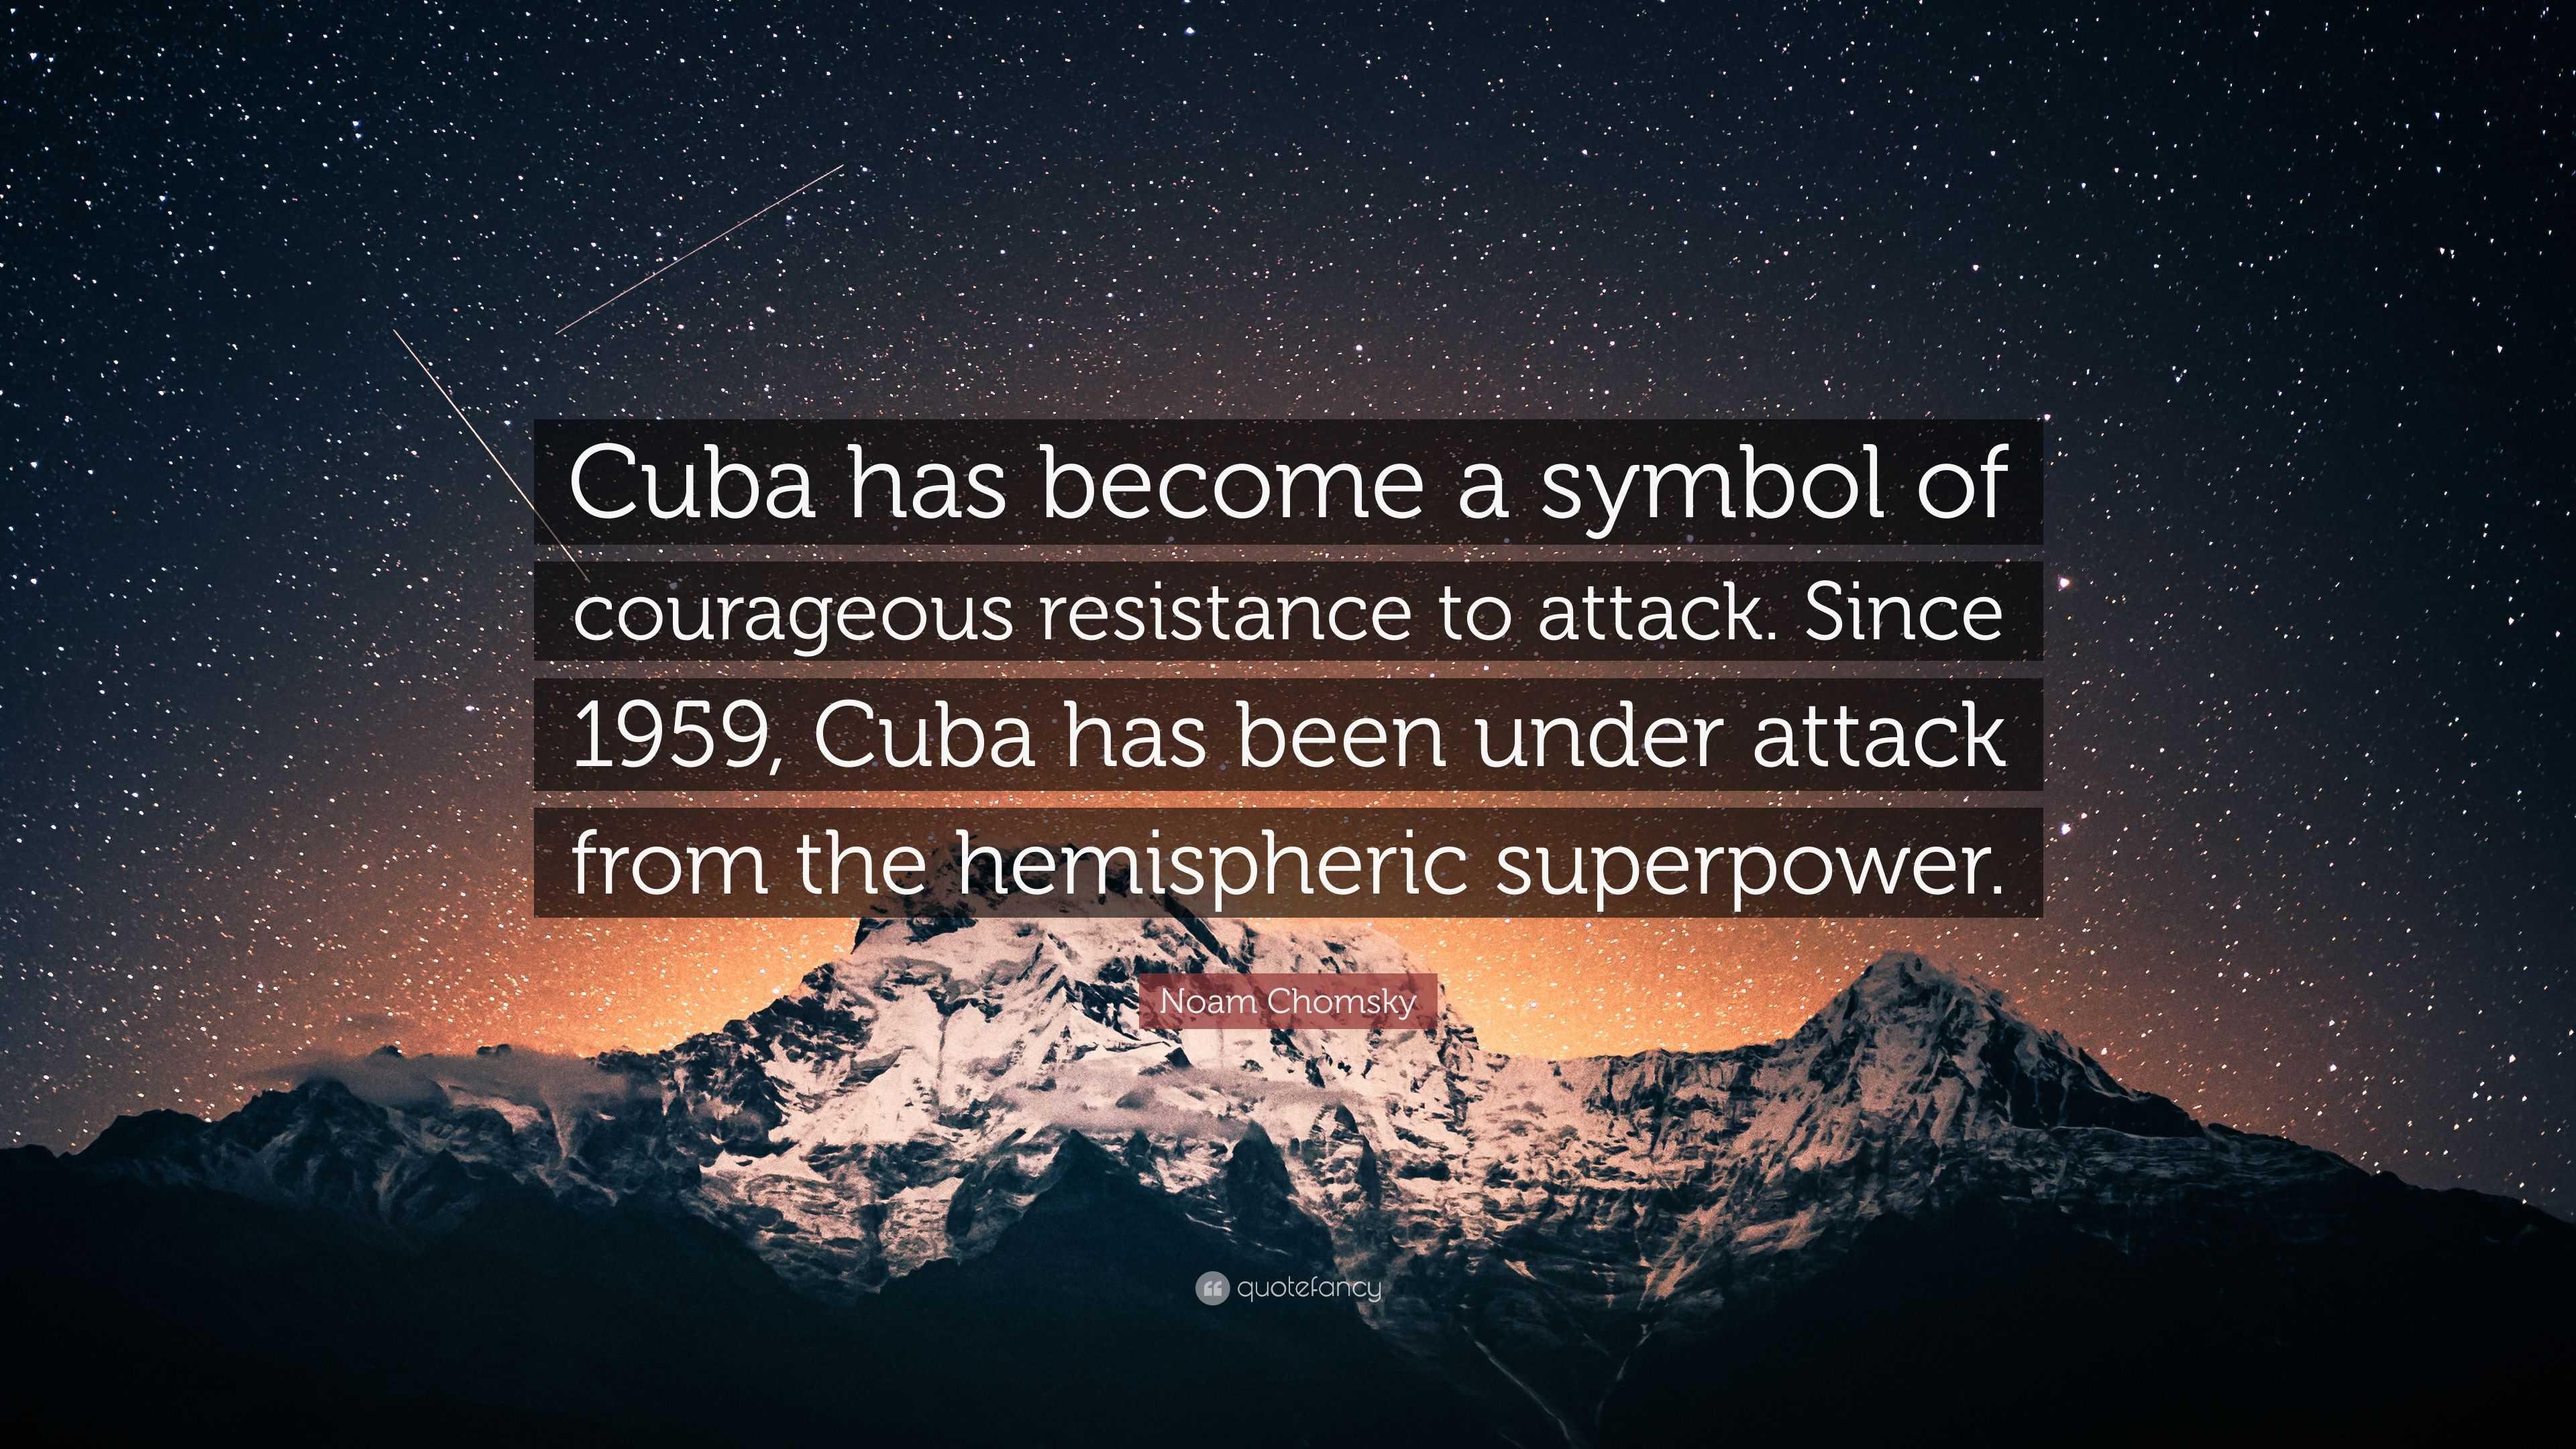 Noam chomsky quote cuba has become a symbol of courageous noam chomsky quote cuba has become a symbol of courageous resistance to attack biocorpaavc Choice Image